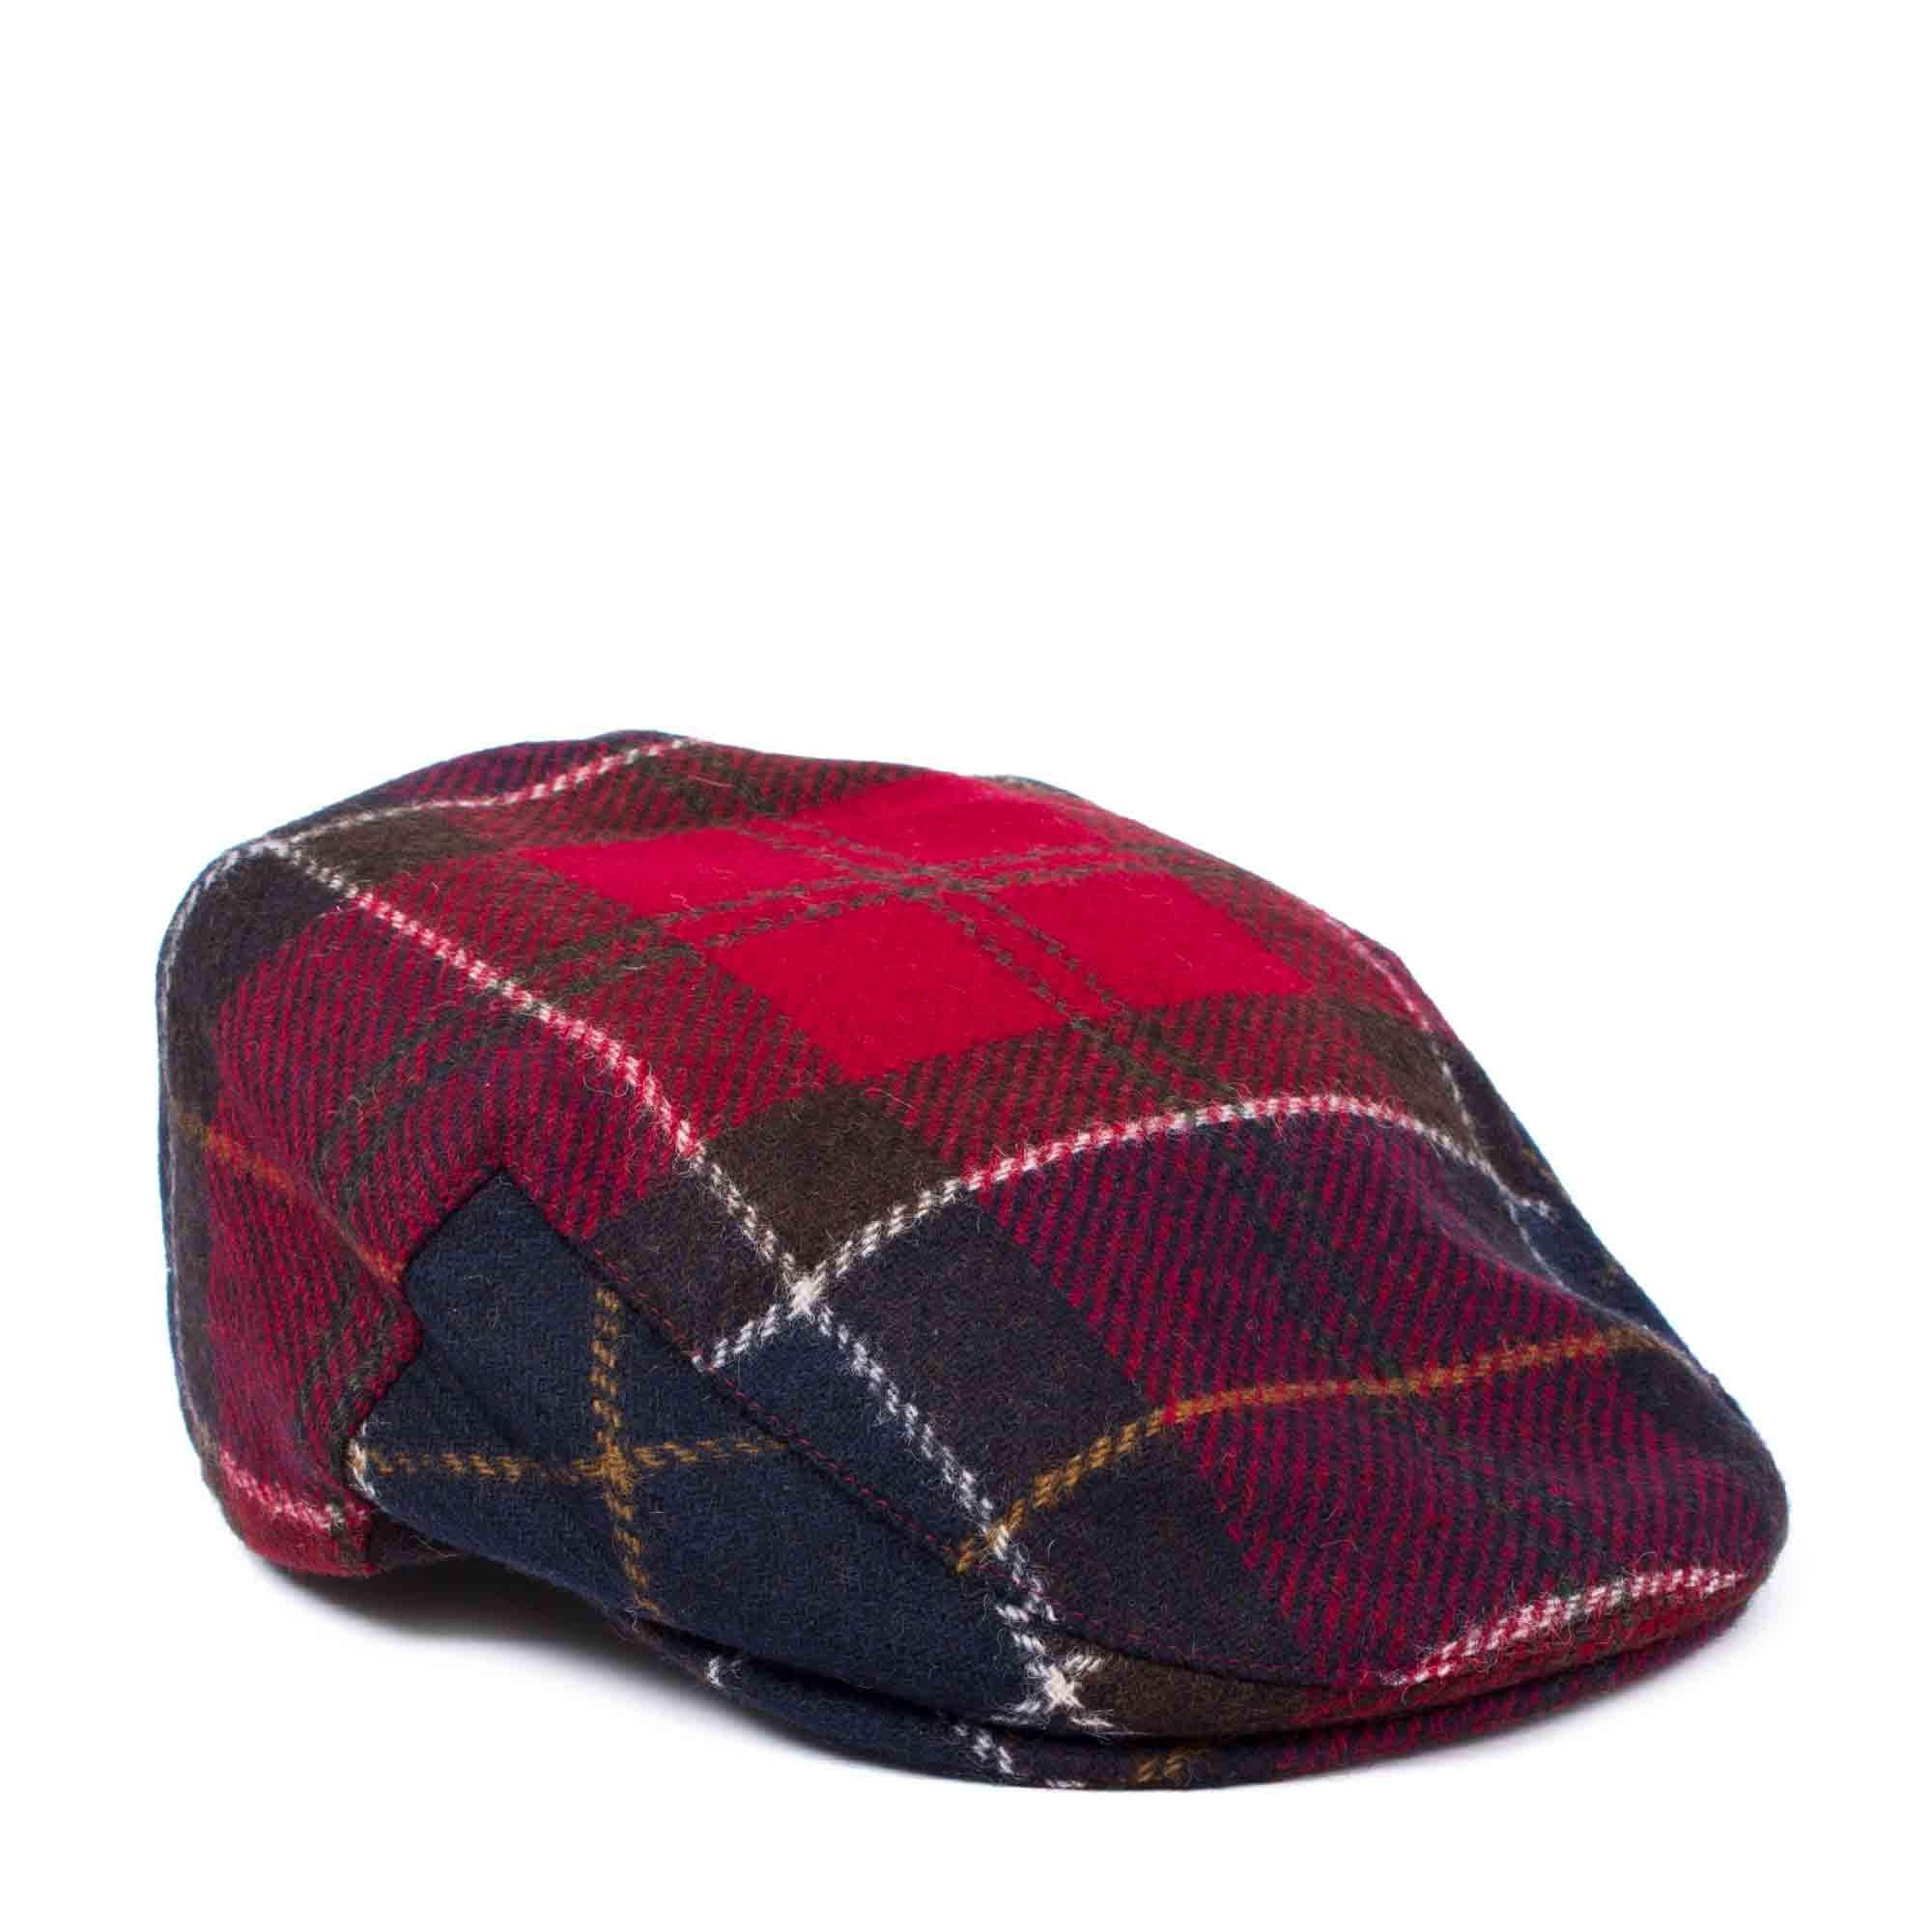 421cb96f Barbour Moons Tweed Cap in Red for Men - Lyst